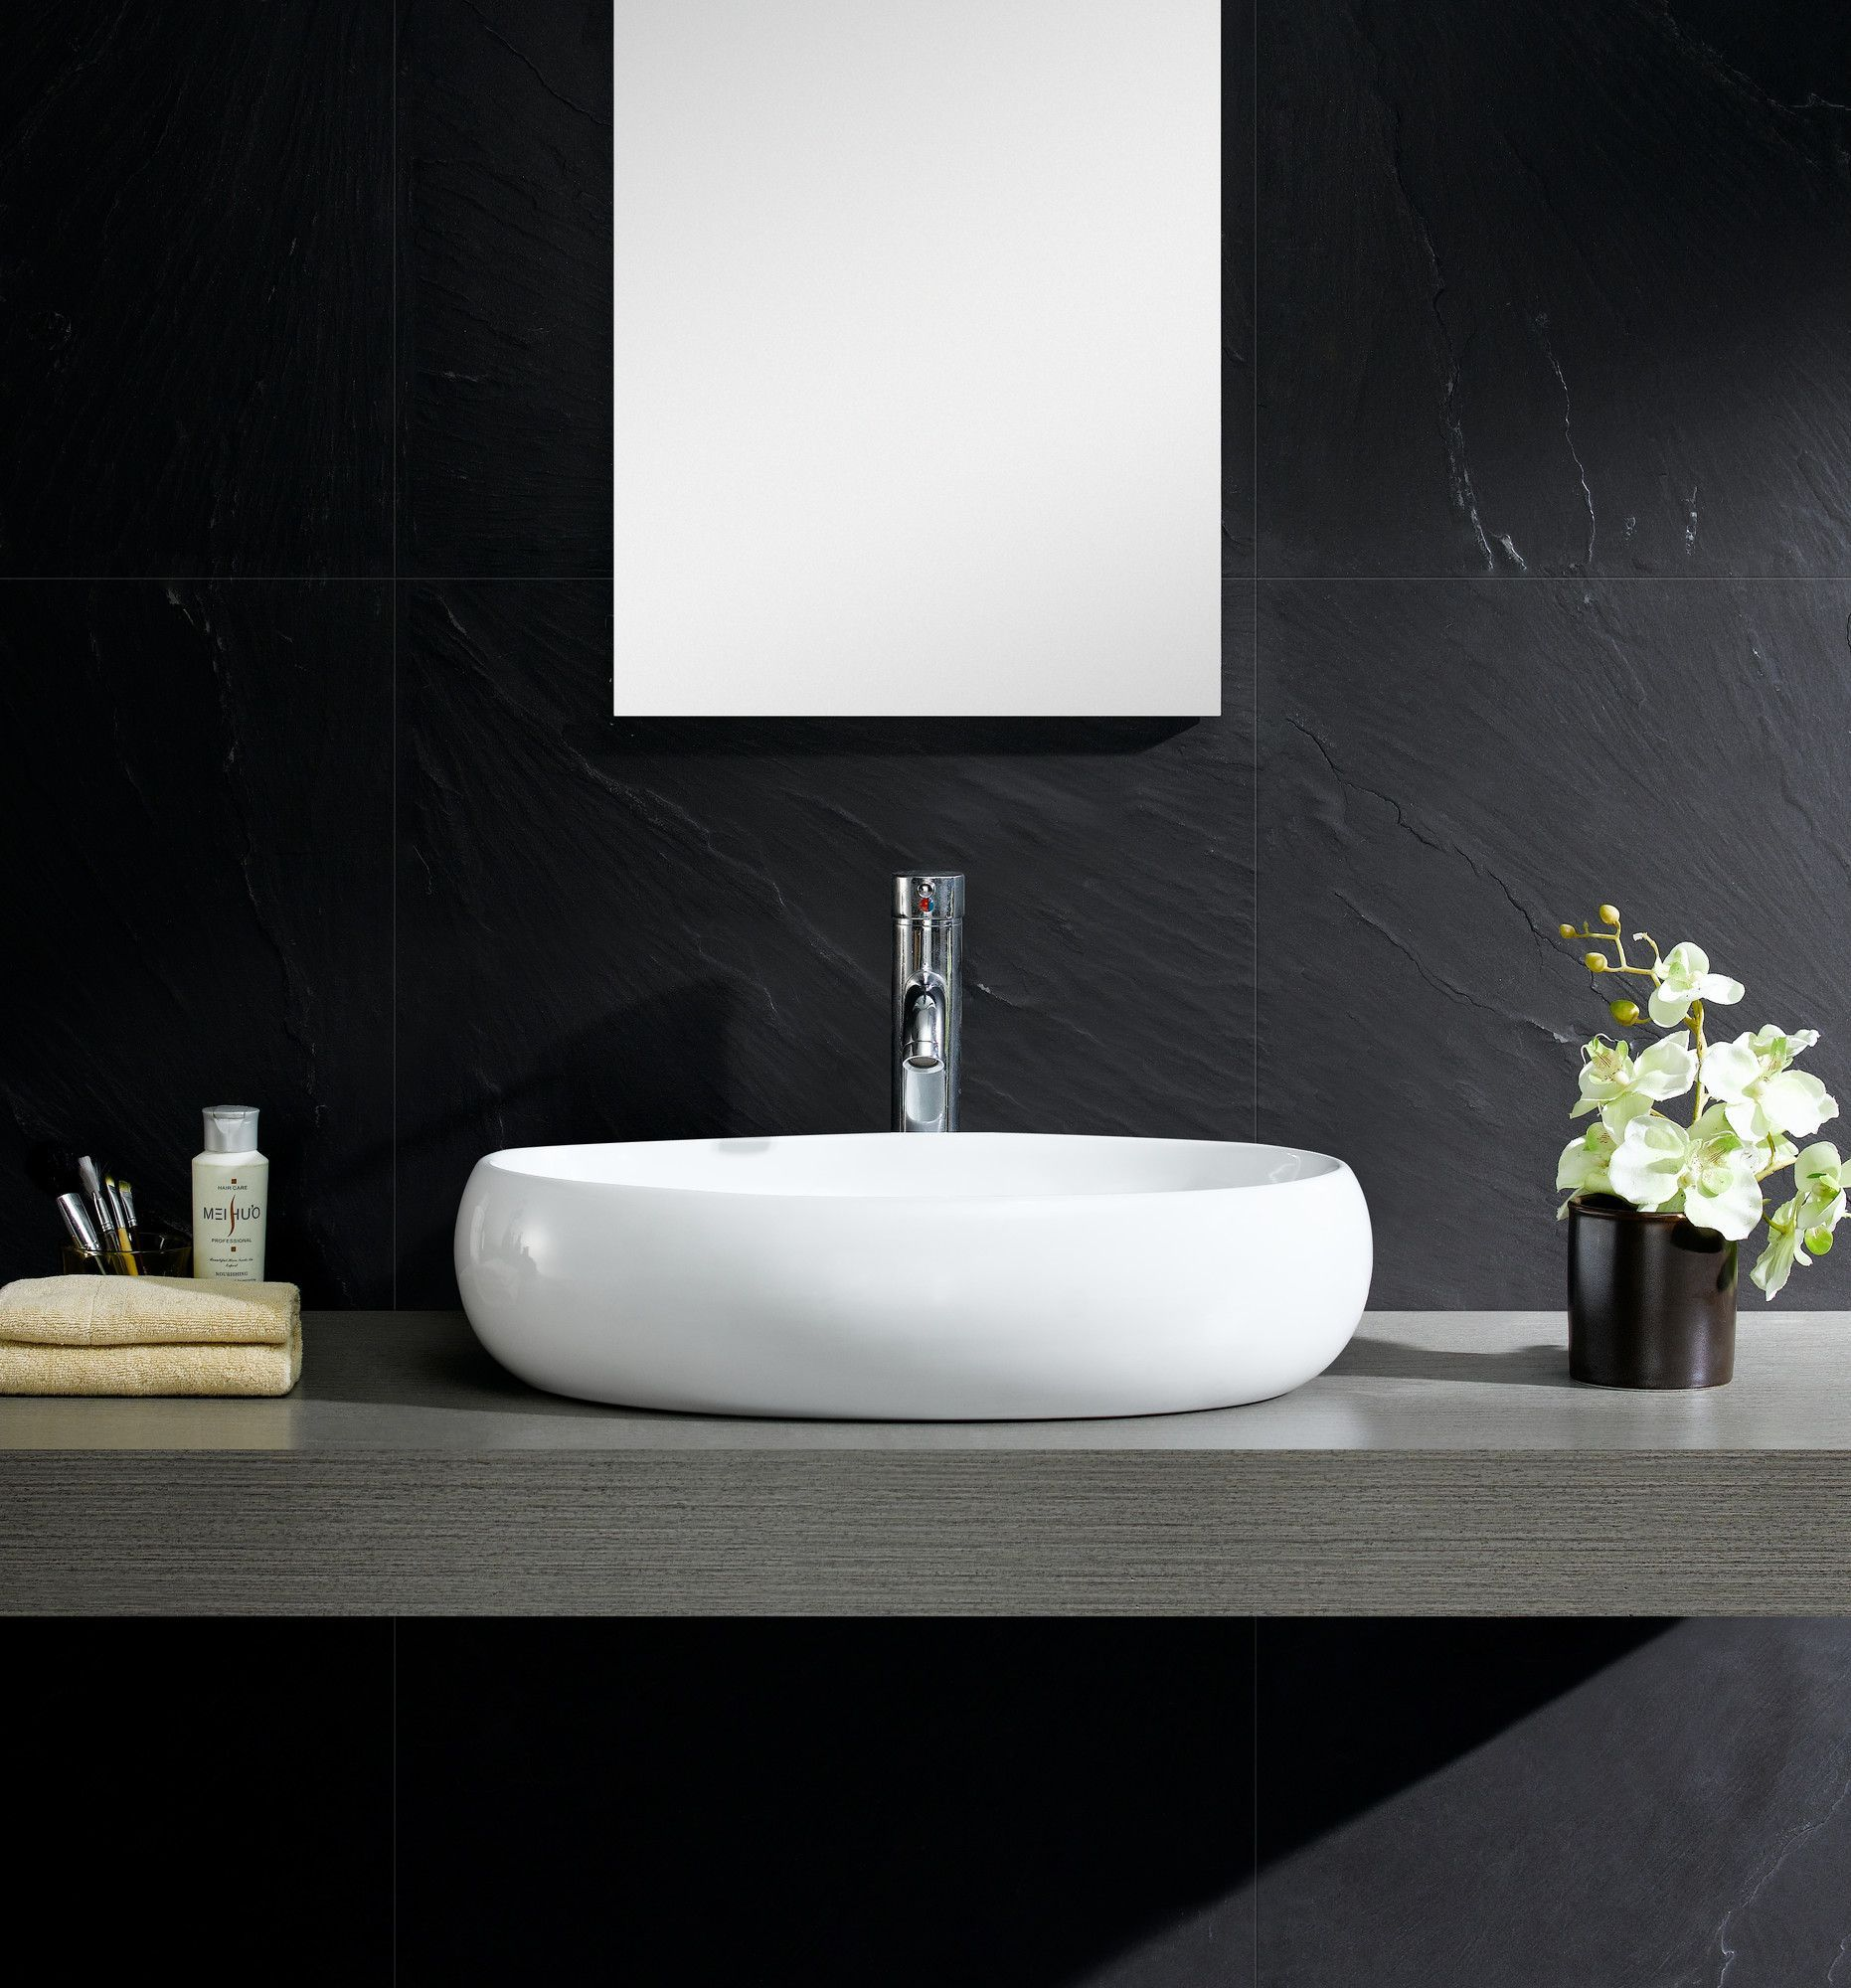 Modern Ceramic Oval Vessel Bathroom Sink | Vessel sink, Sinks and ...